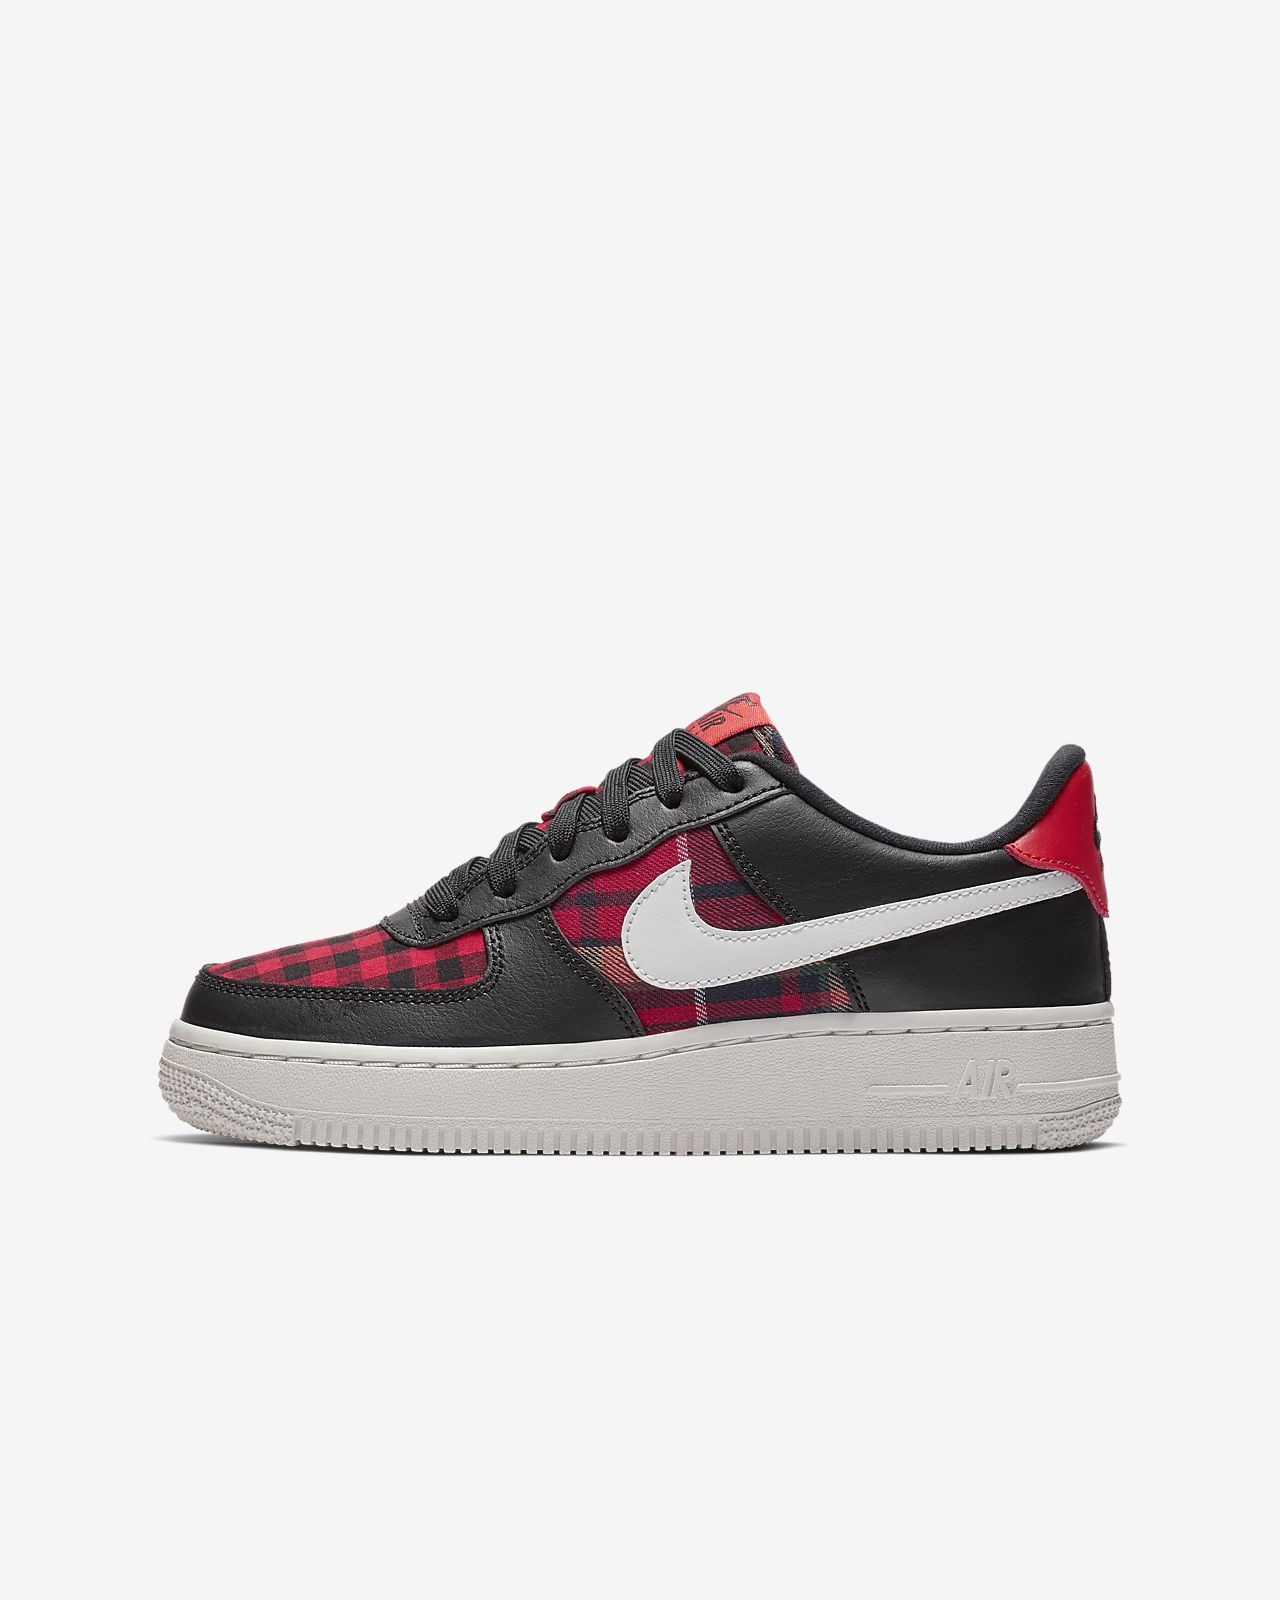 2dfda1e14c75 Nike Air Force 1 LV8 Big Kids  Shoe. Nike.com